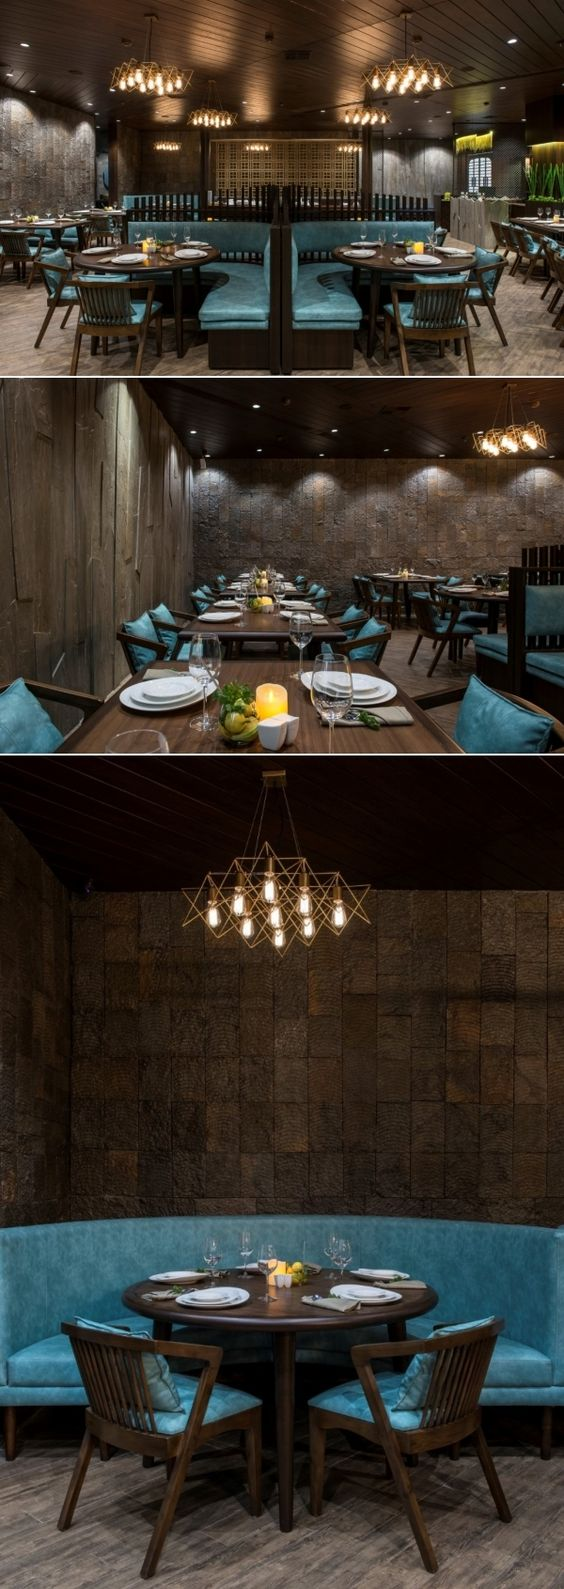 Restaurant Interior Has Modern Experience